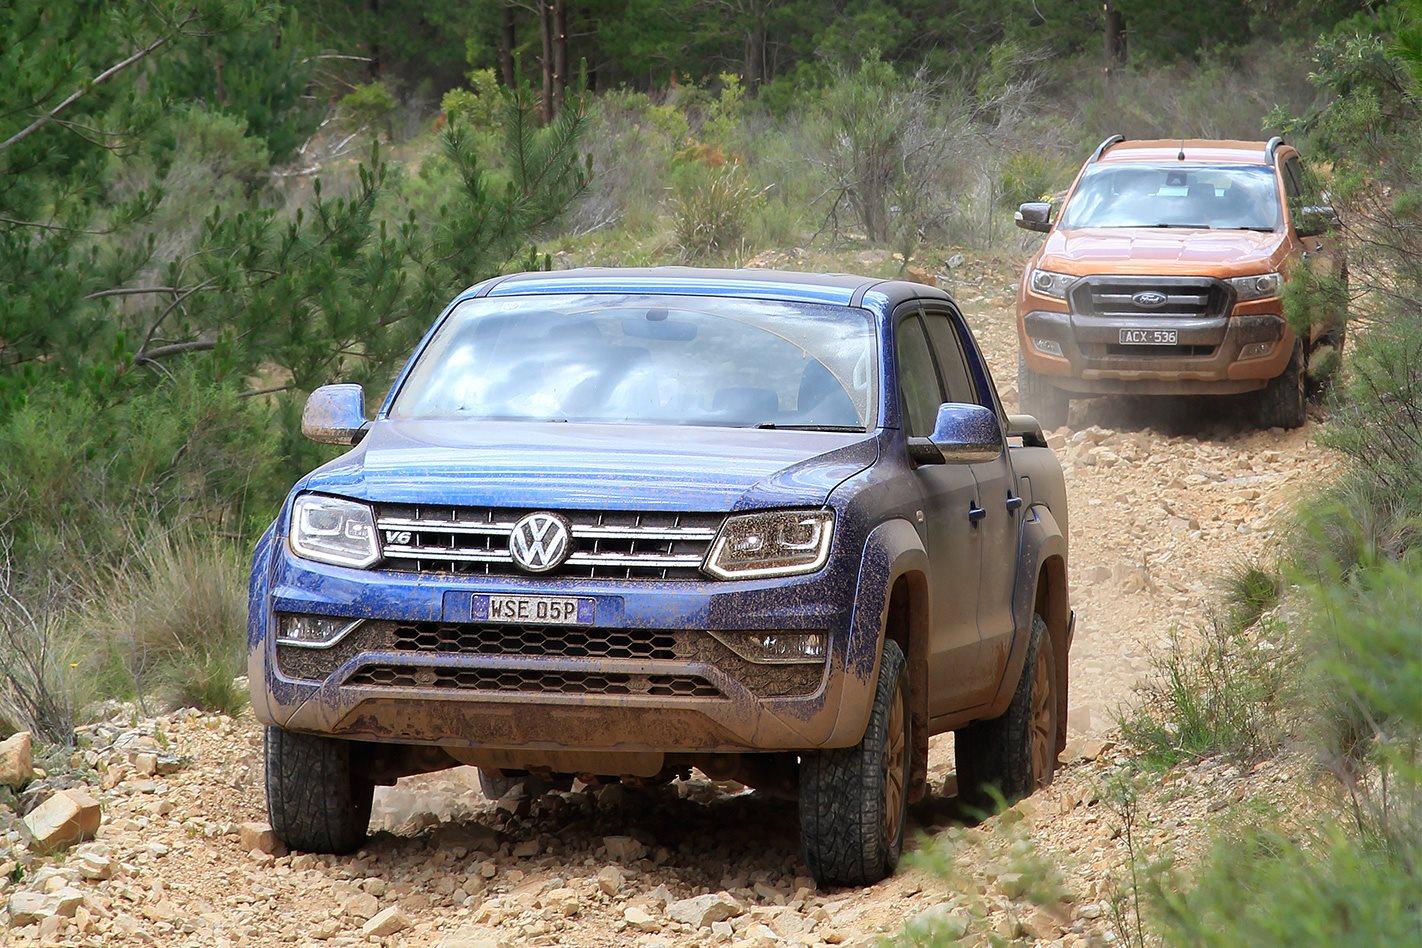 Volkswagen Amarok V6 vs Ford Ranger Wildtrak comparison review